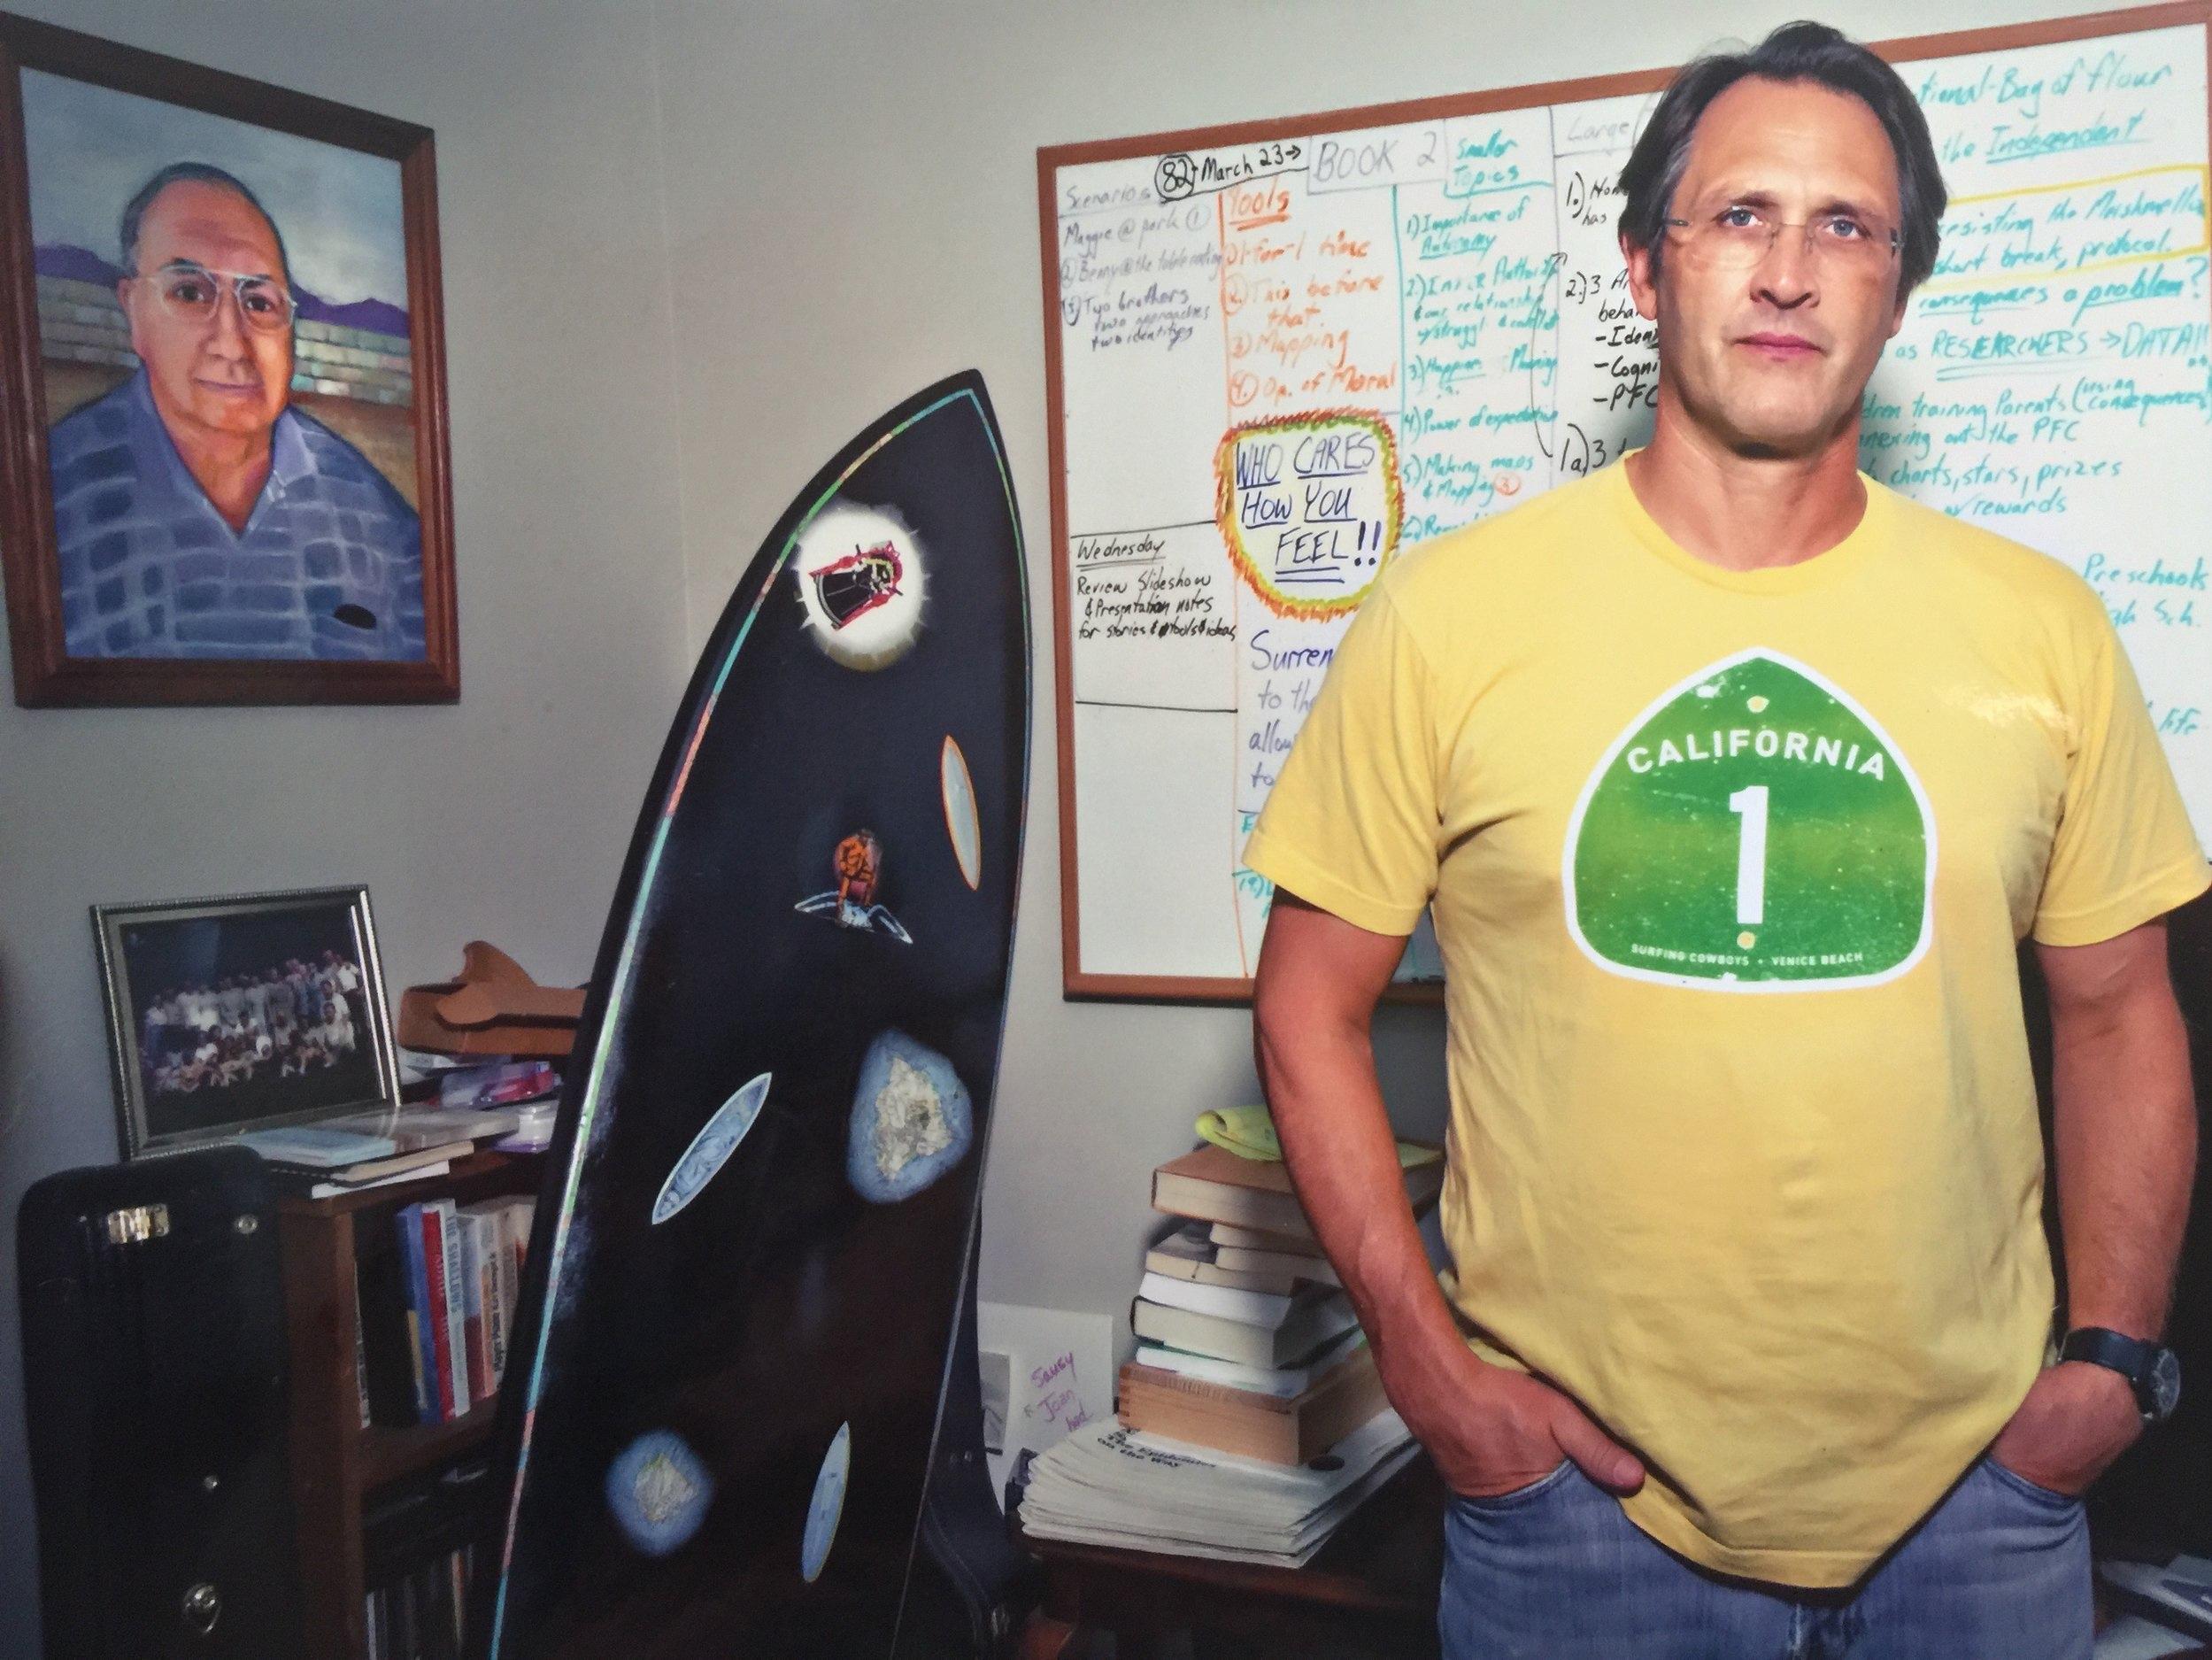 Joe Newman at his home office in Santa Monica, California.